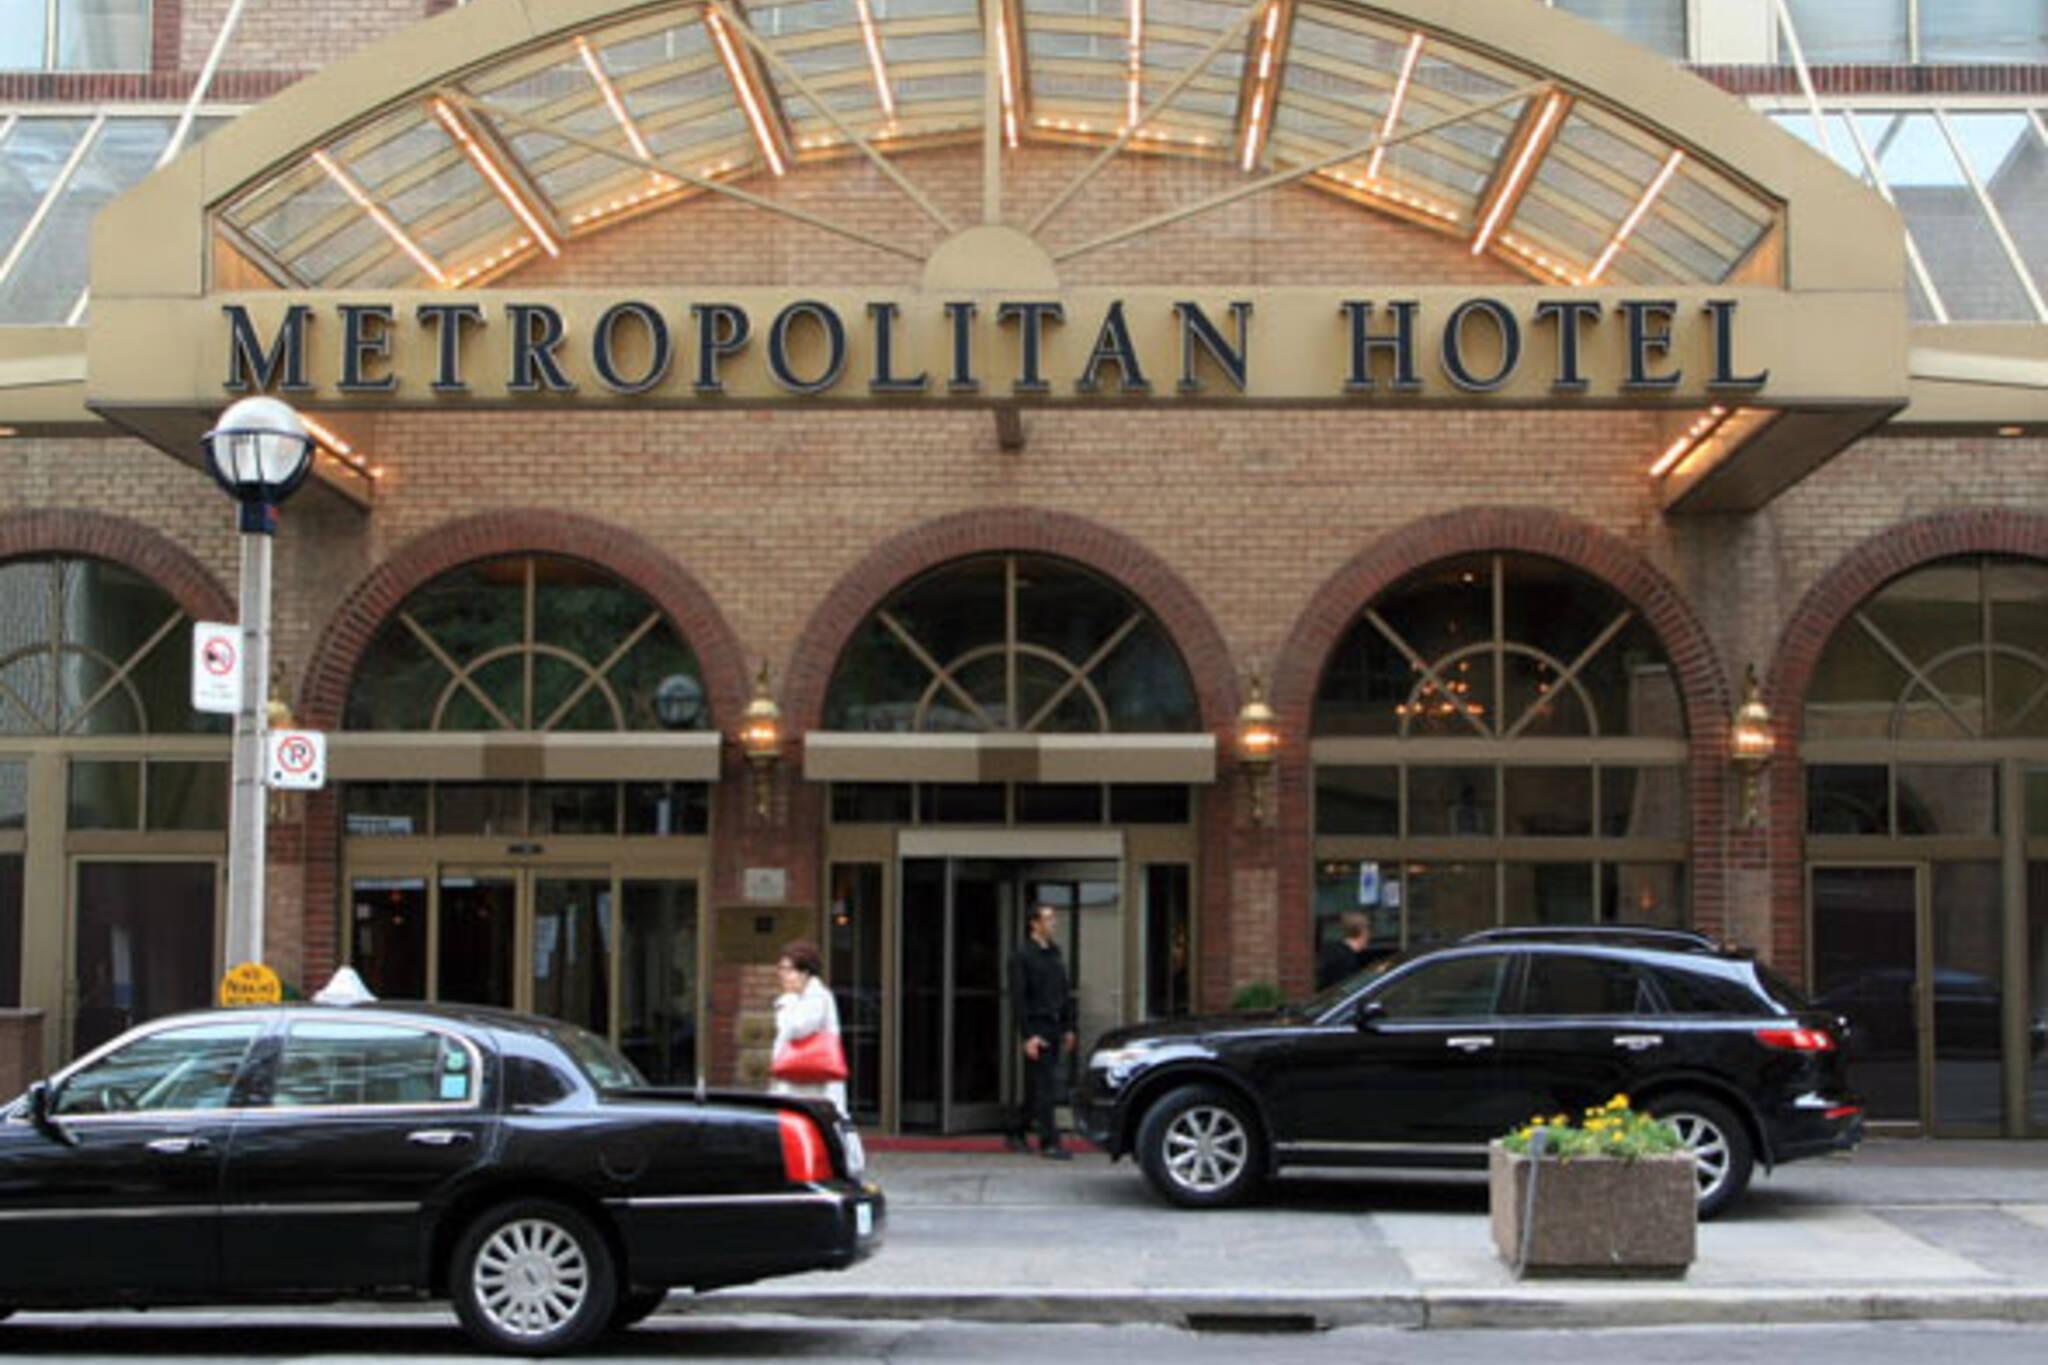 metropolitan hotel lai wah heen